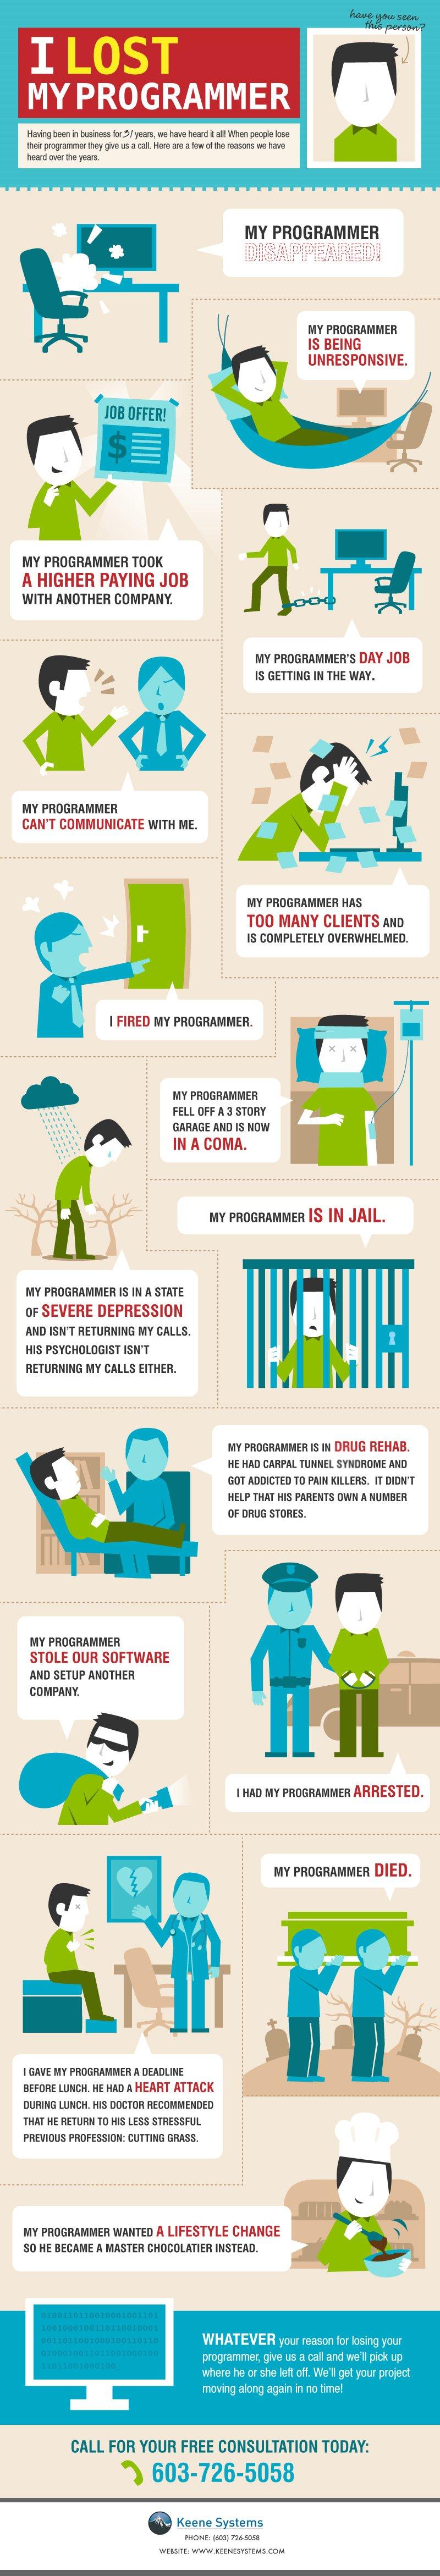 I-Lost-My-Programmer